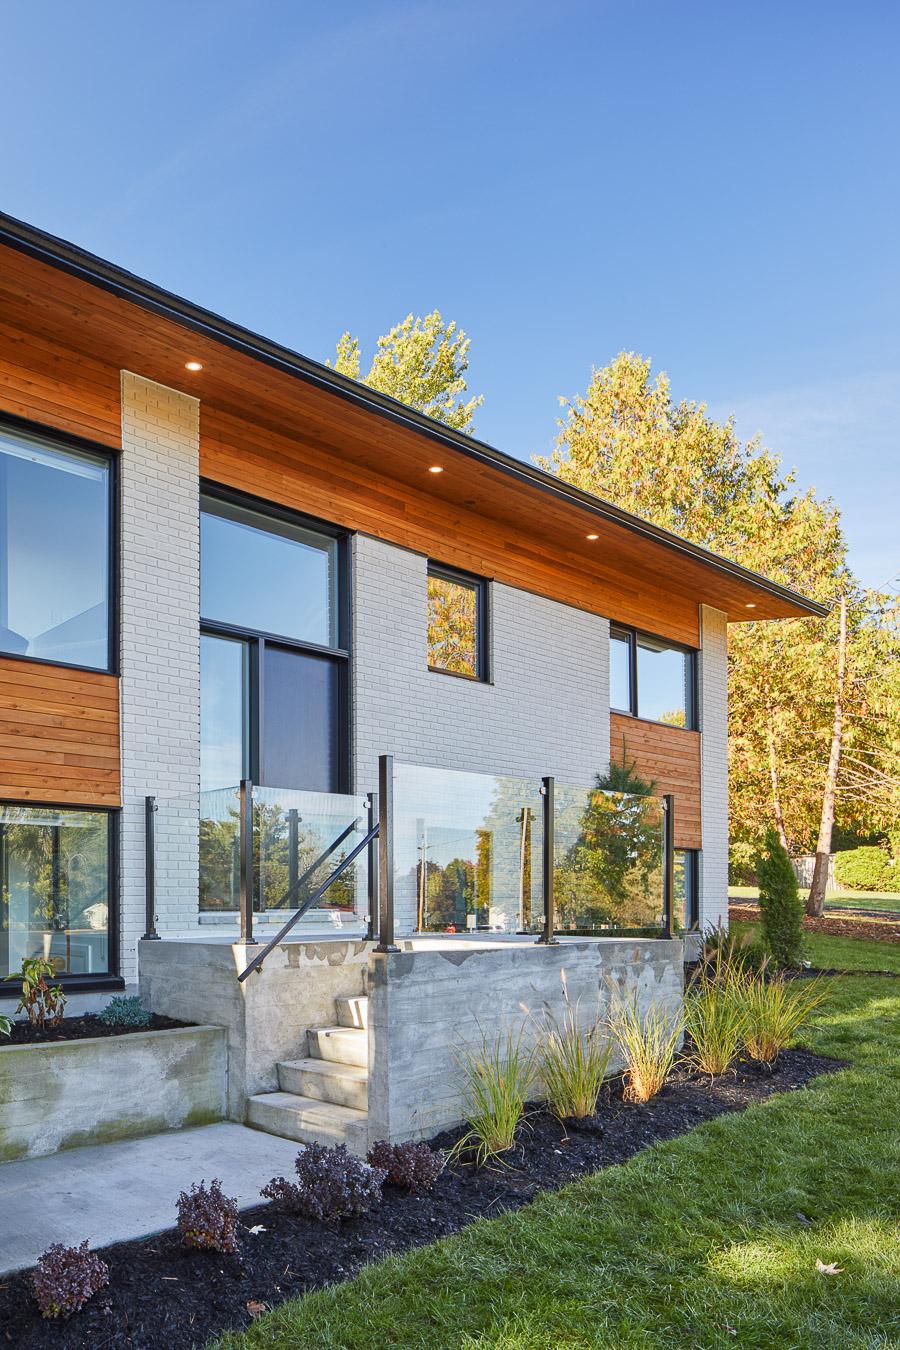 009-Shean Architects River Road.jpg